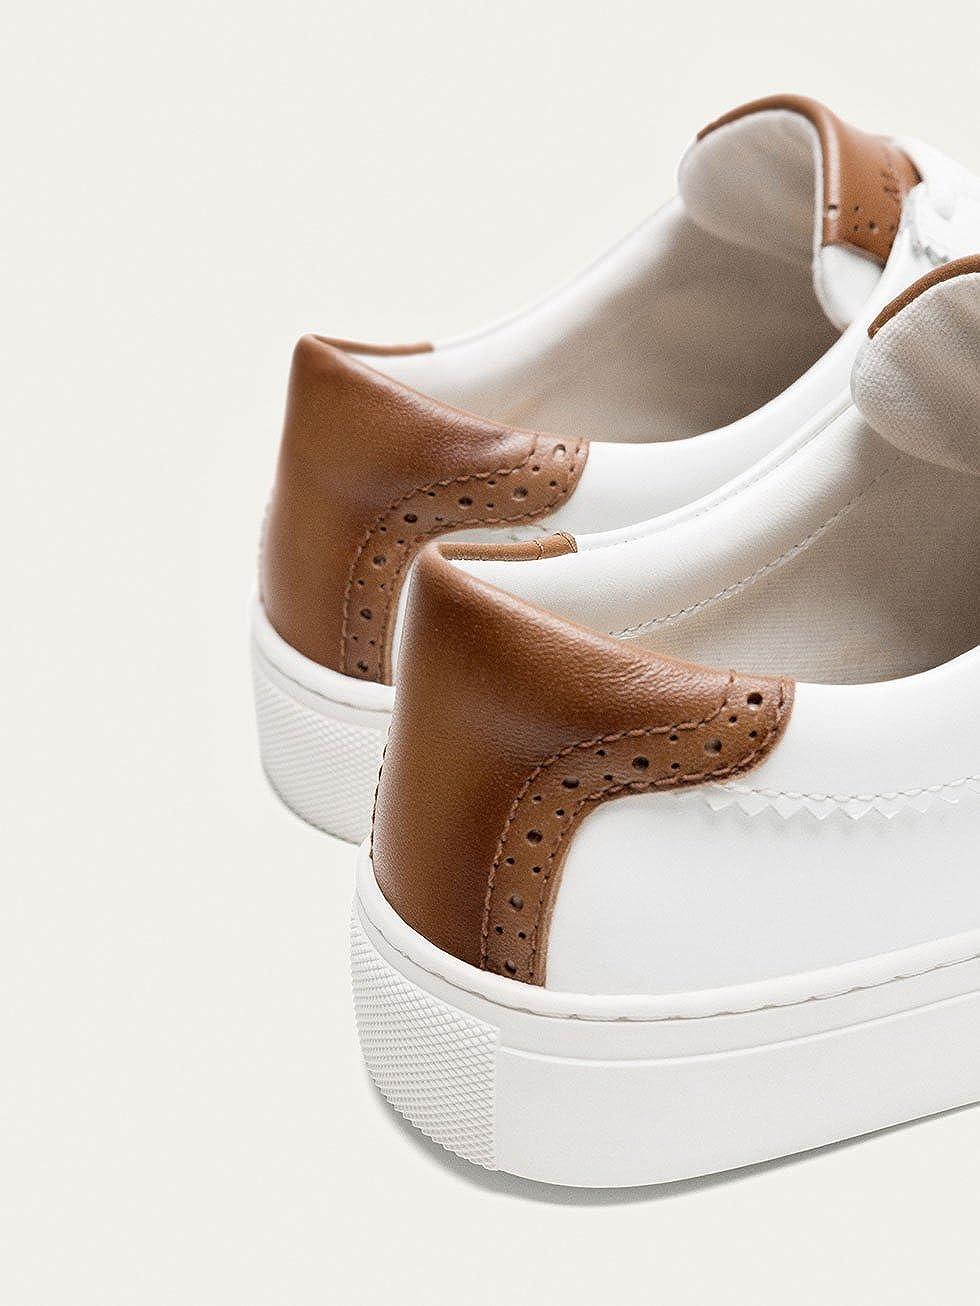 0091a979bdf4ef Massimo Dutti Damen Weißer Ledersneaker 39 EU (39